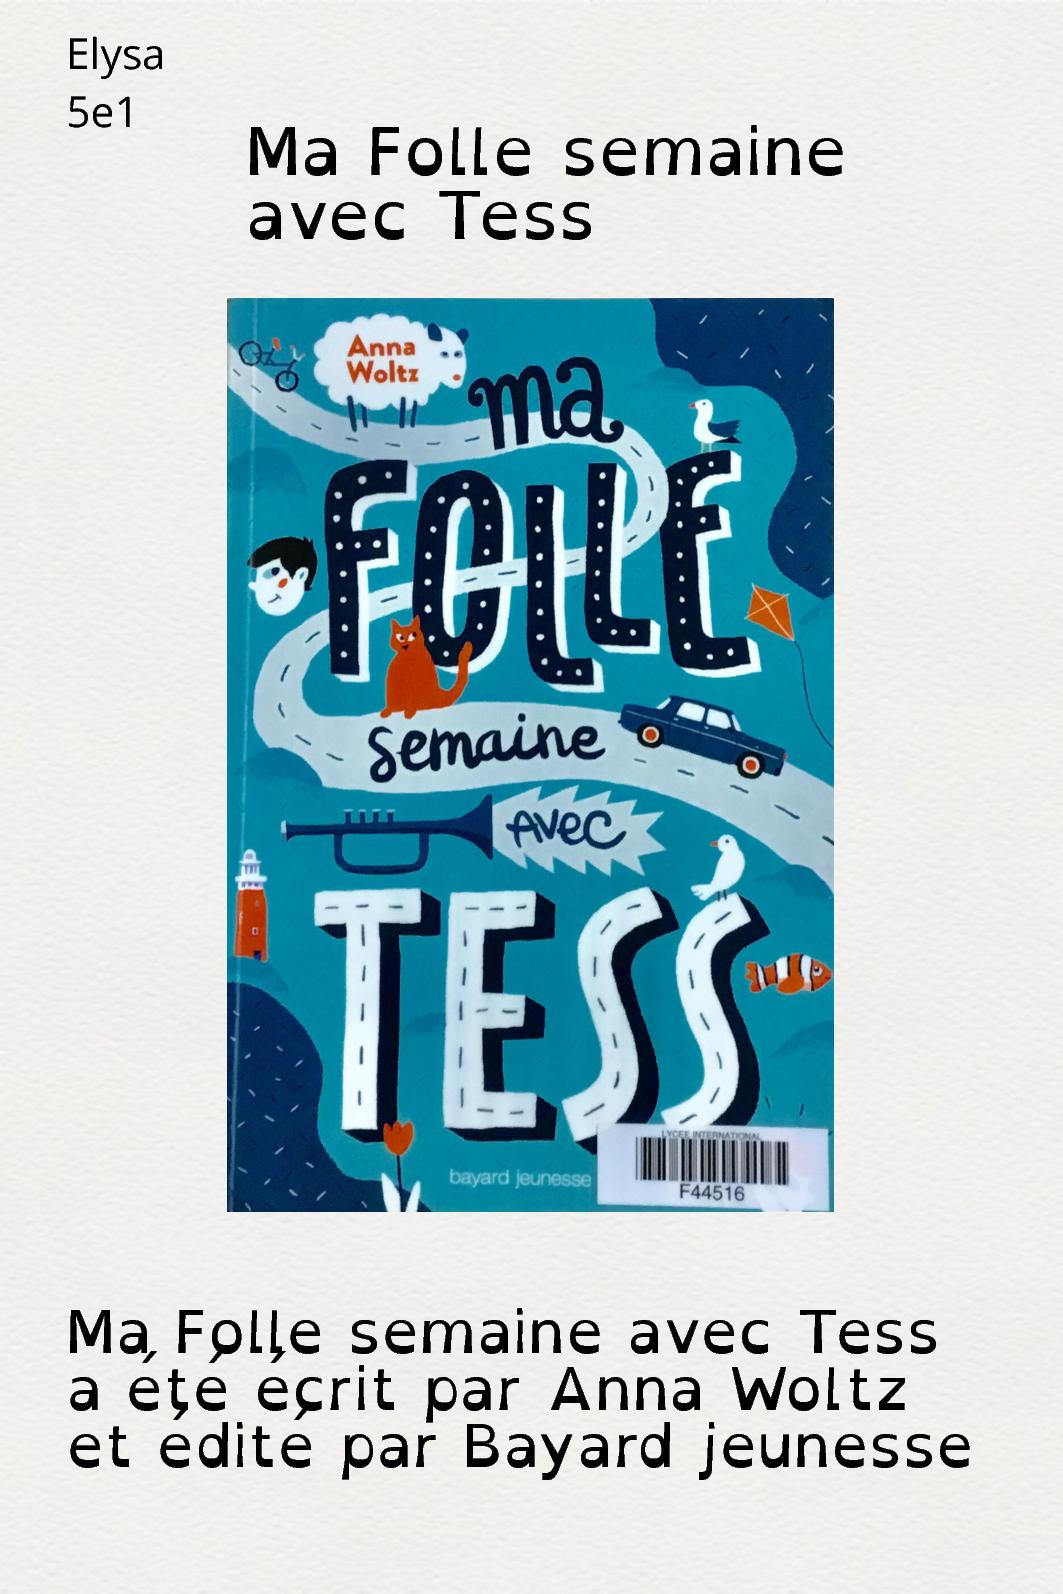 Ma Folle Semaine Avec Tess : folle, semaine, Calaméo, Elysa, Présente, Folle, Semaine, Tess